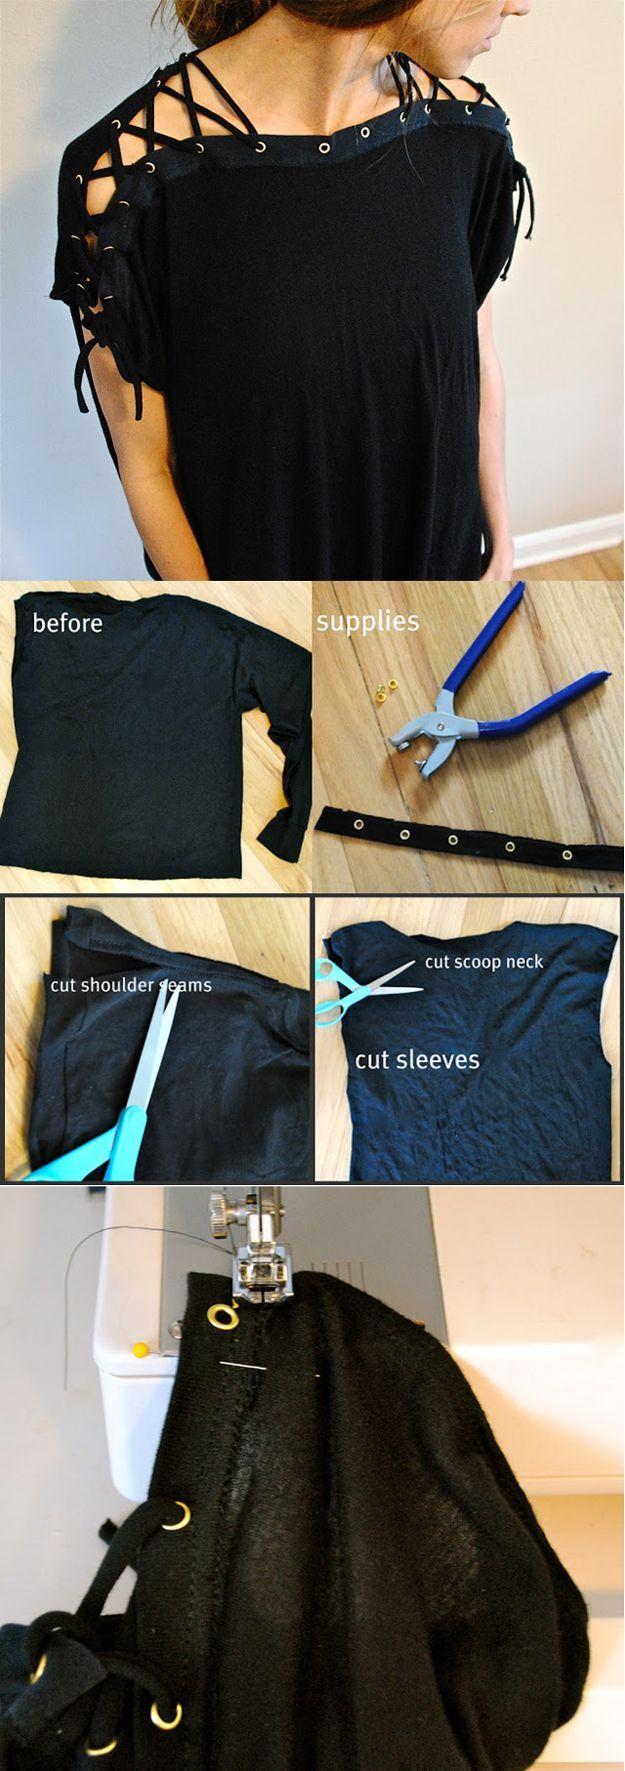 Laced Up Collar Sleeves DIY | Hot Top Design Tutorial by DIY Ready at diyready.com/diy-clothes-sewing-blouses-tutorial/: